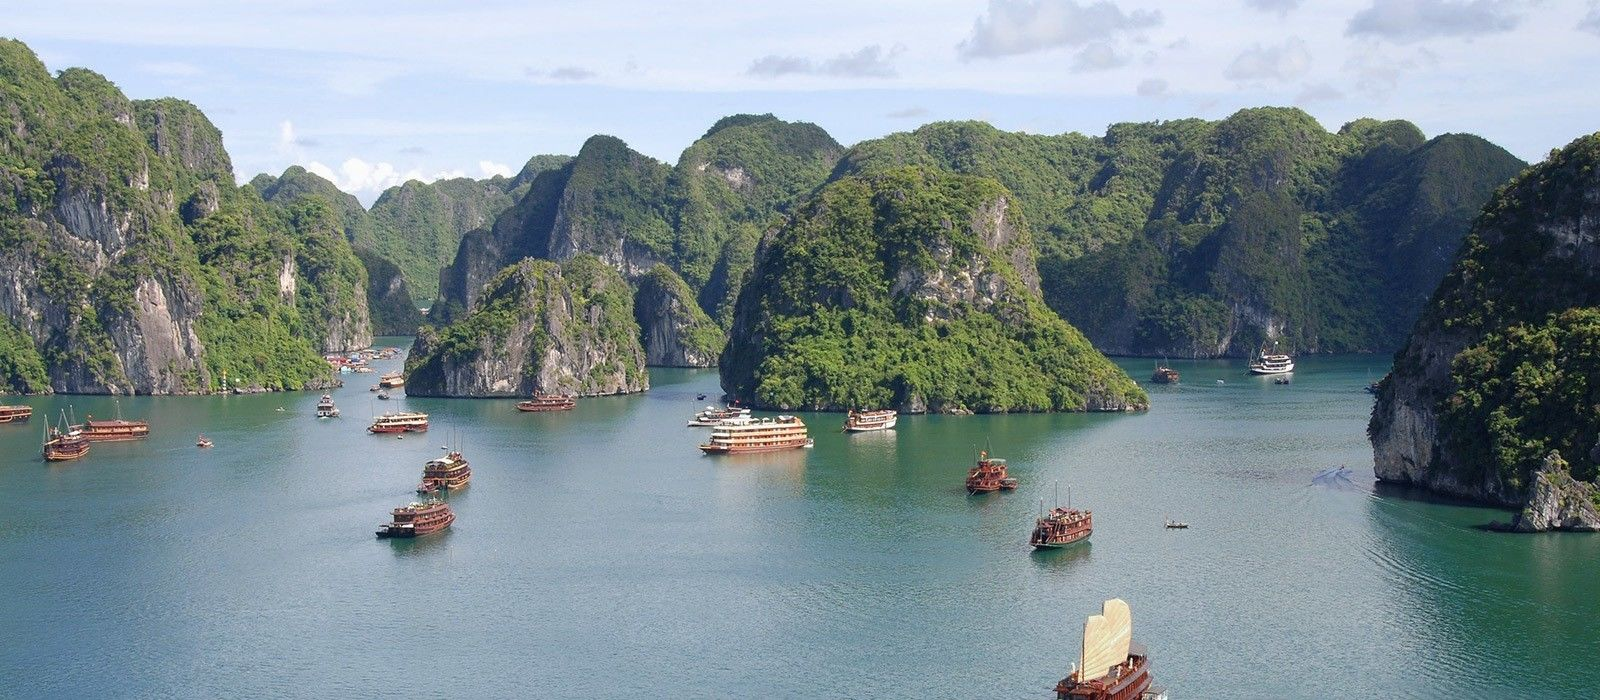 Travel Destination Vietnam